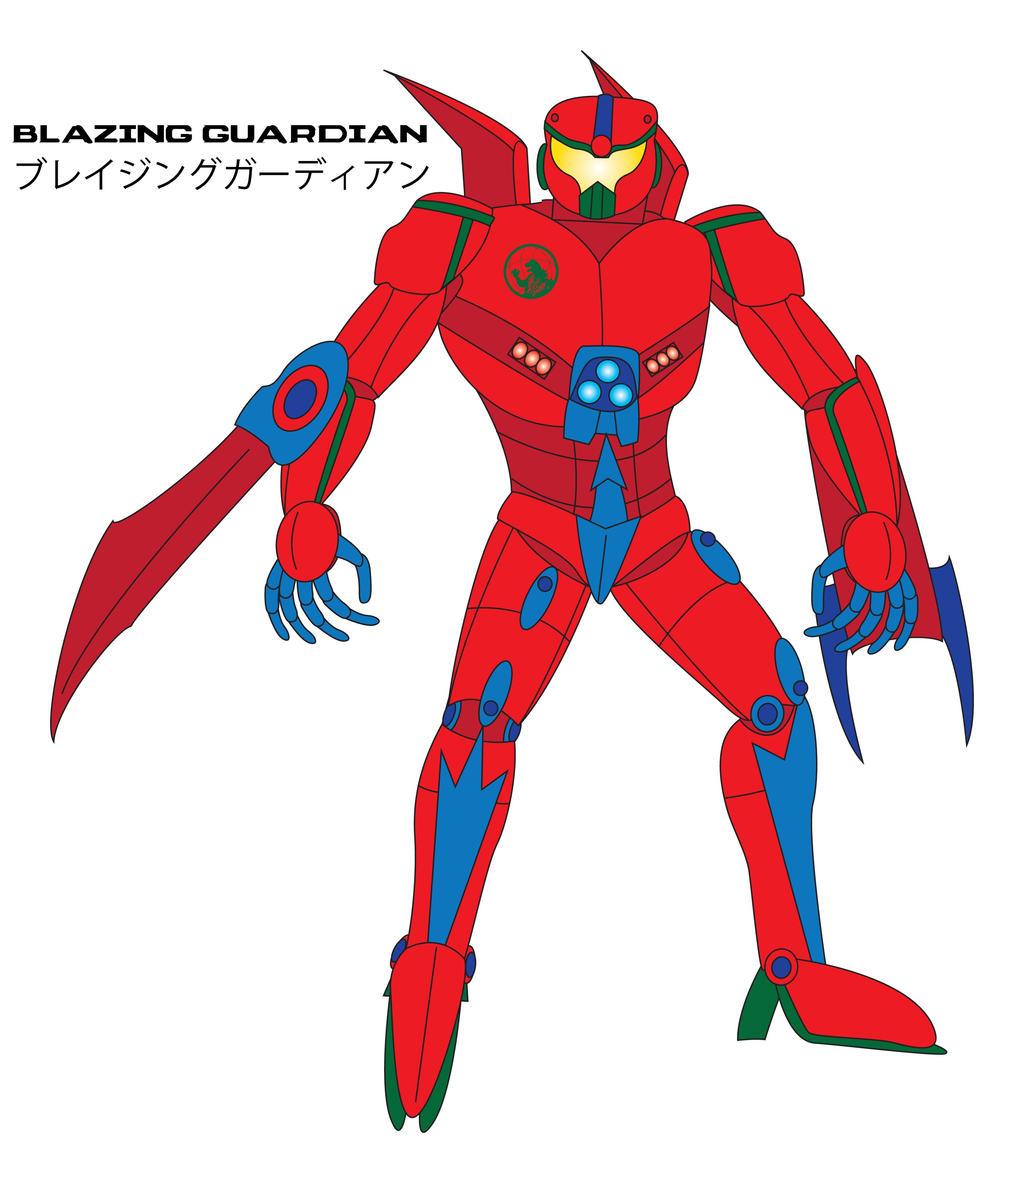 Kaiju Awakened - BLAZING GUARDIAN by Daizua123